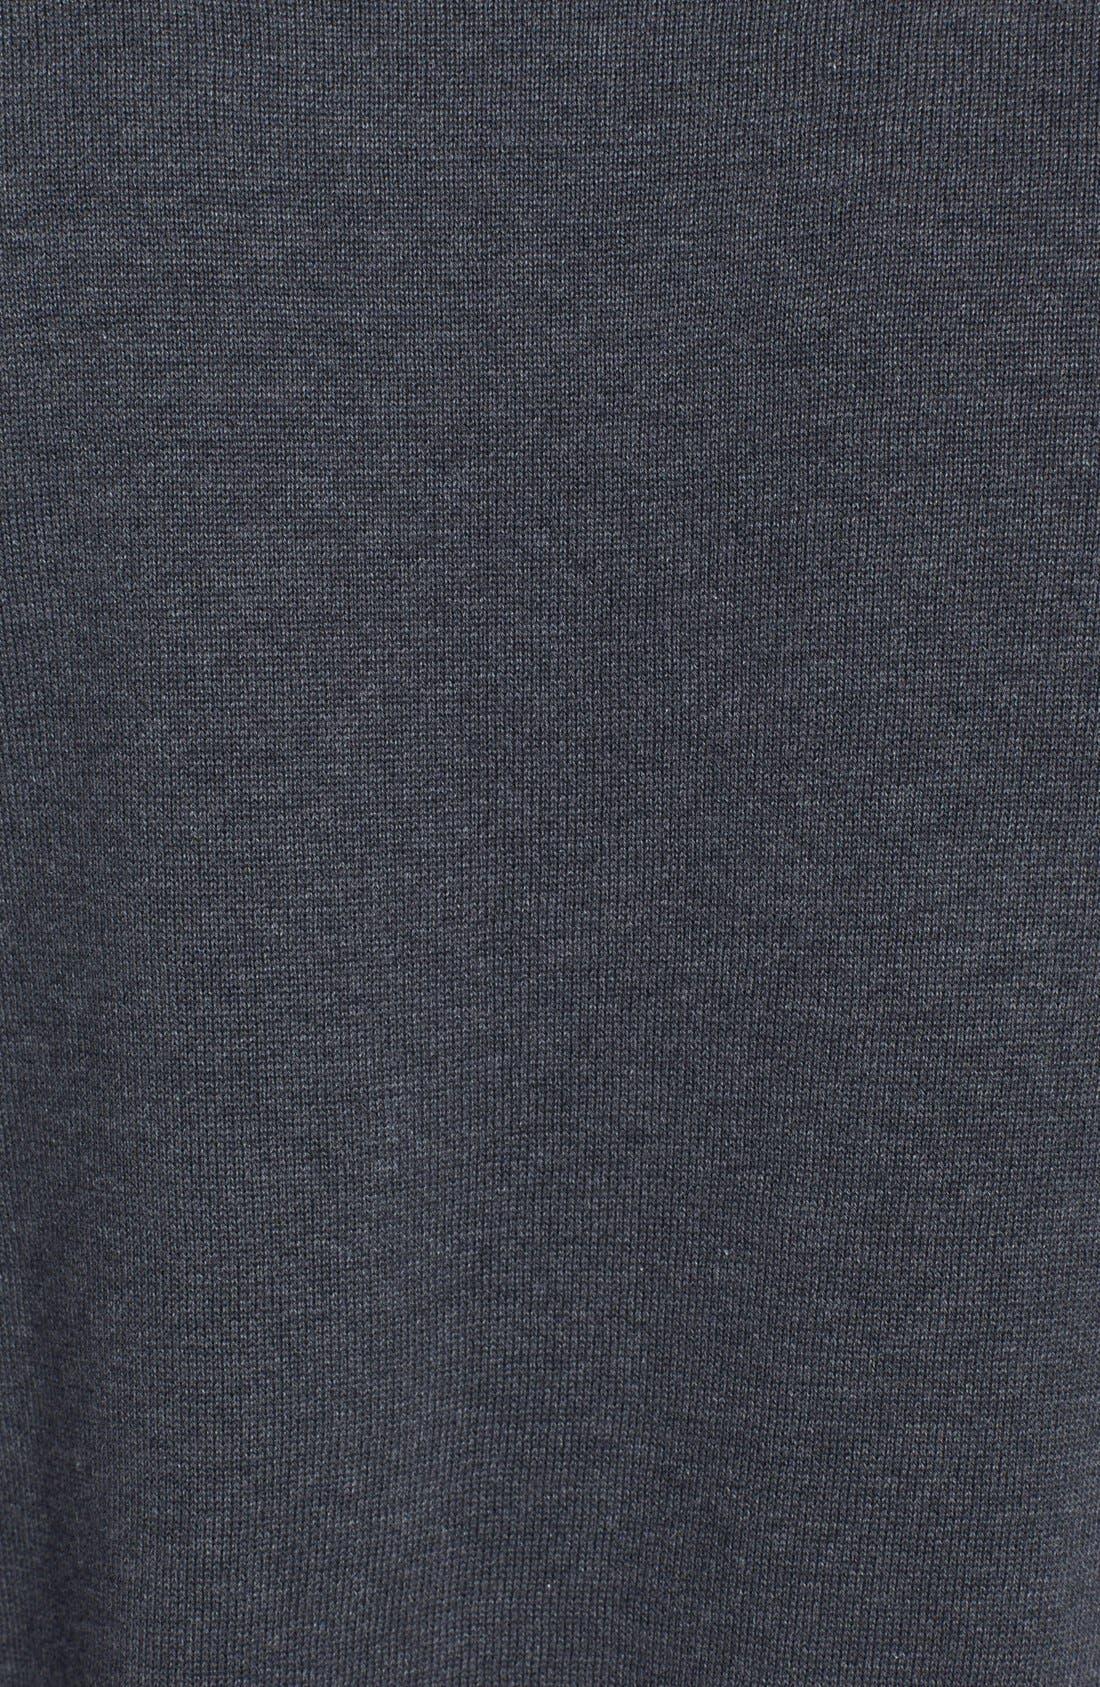 Alternate Image 3  - Zegna Sport Water Repellent Crew Neck Sweater